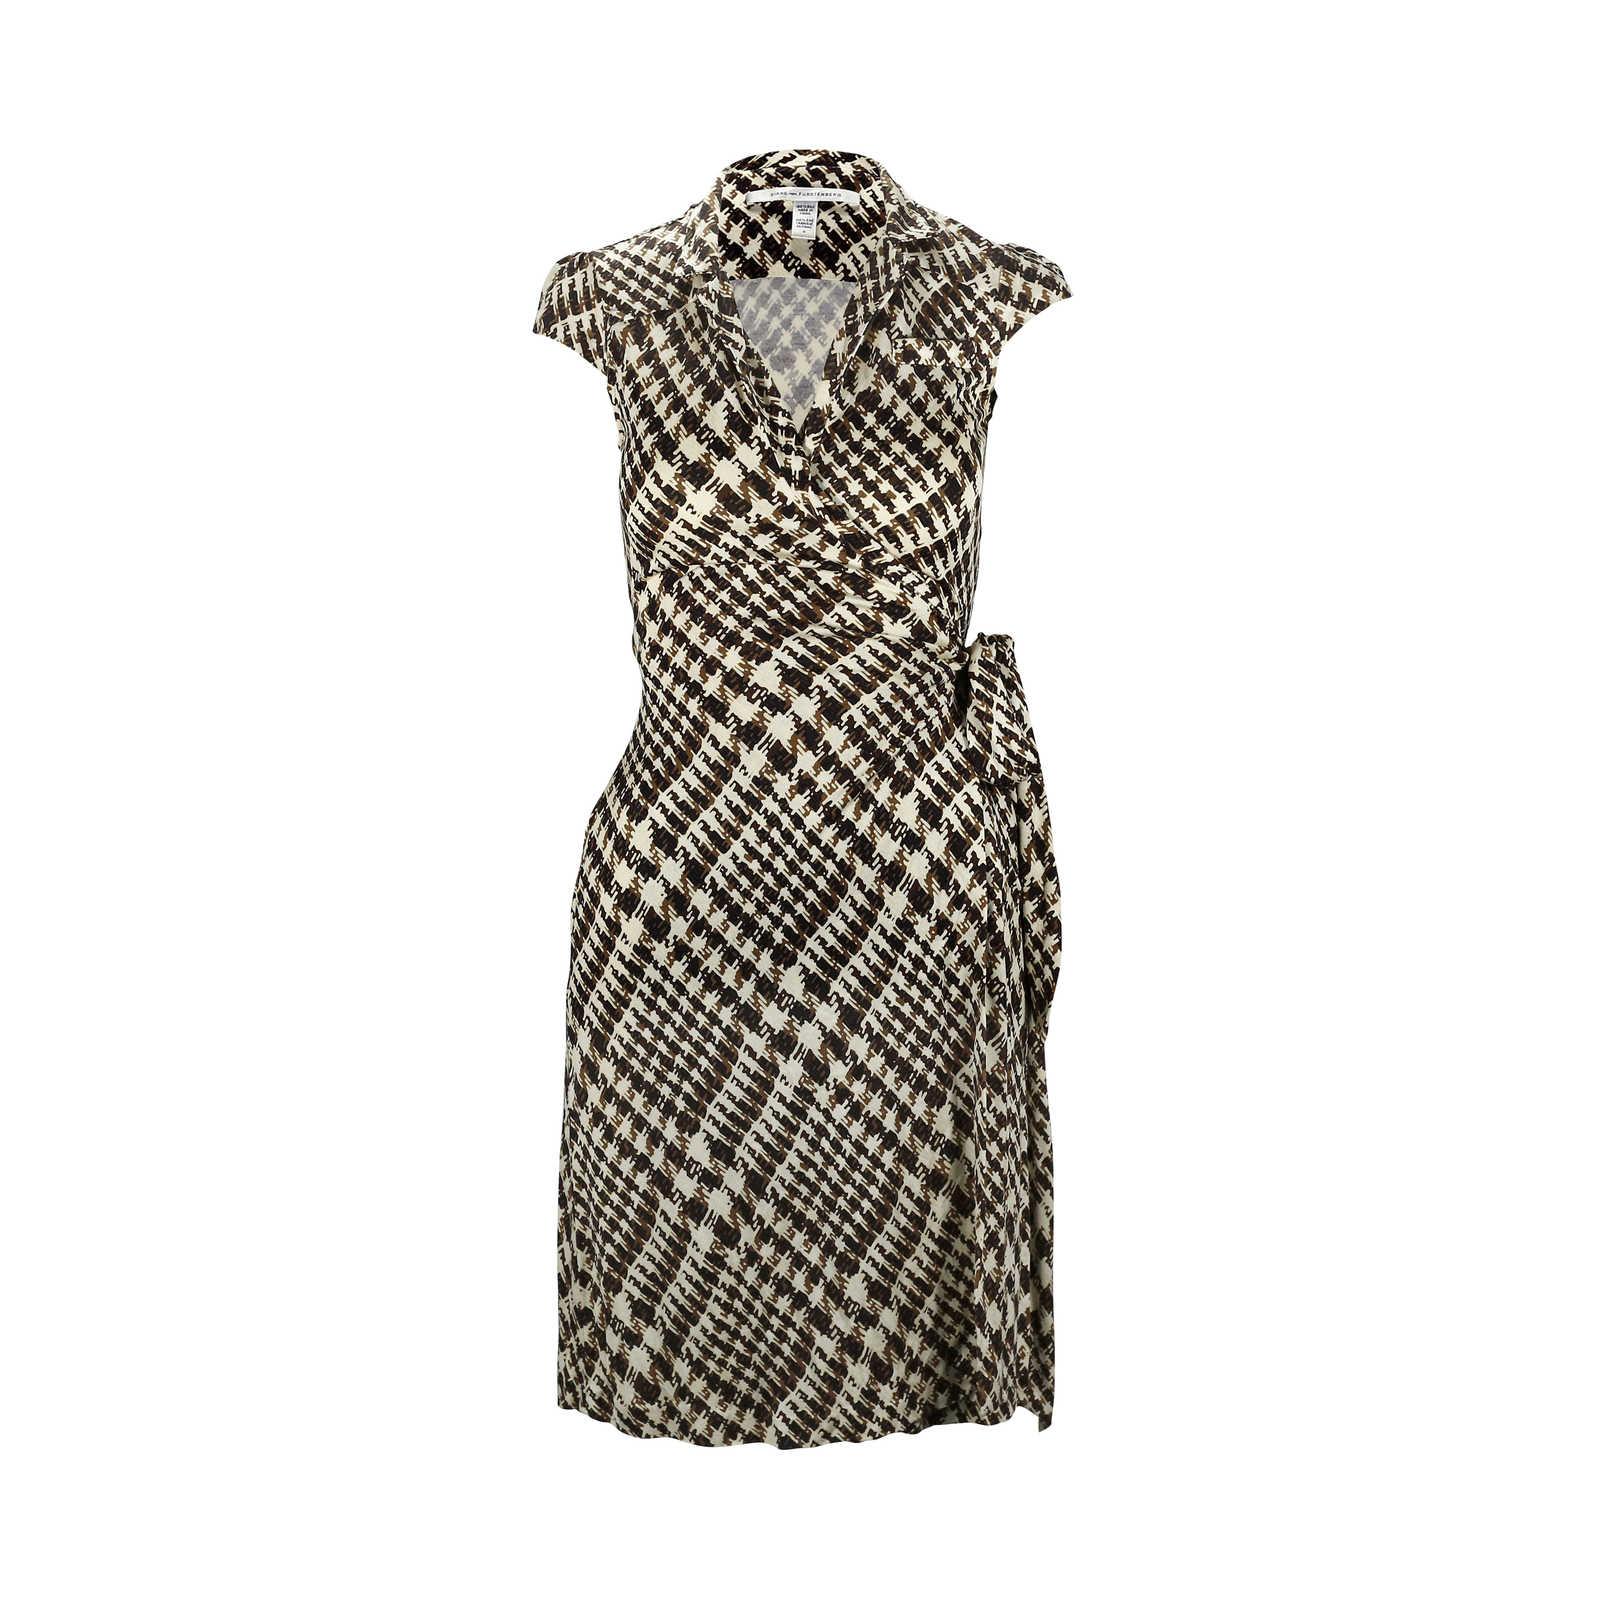 Second Hand Diane Von Furstenberg Griffith Wrap Dress | THE FIFTH ...